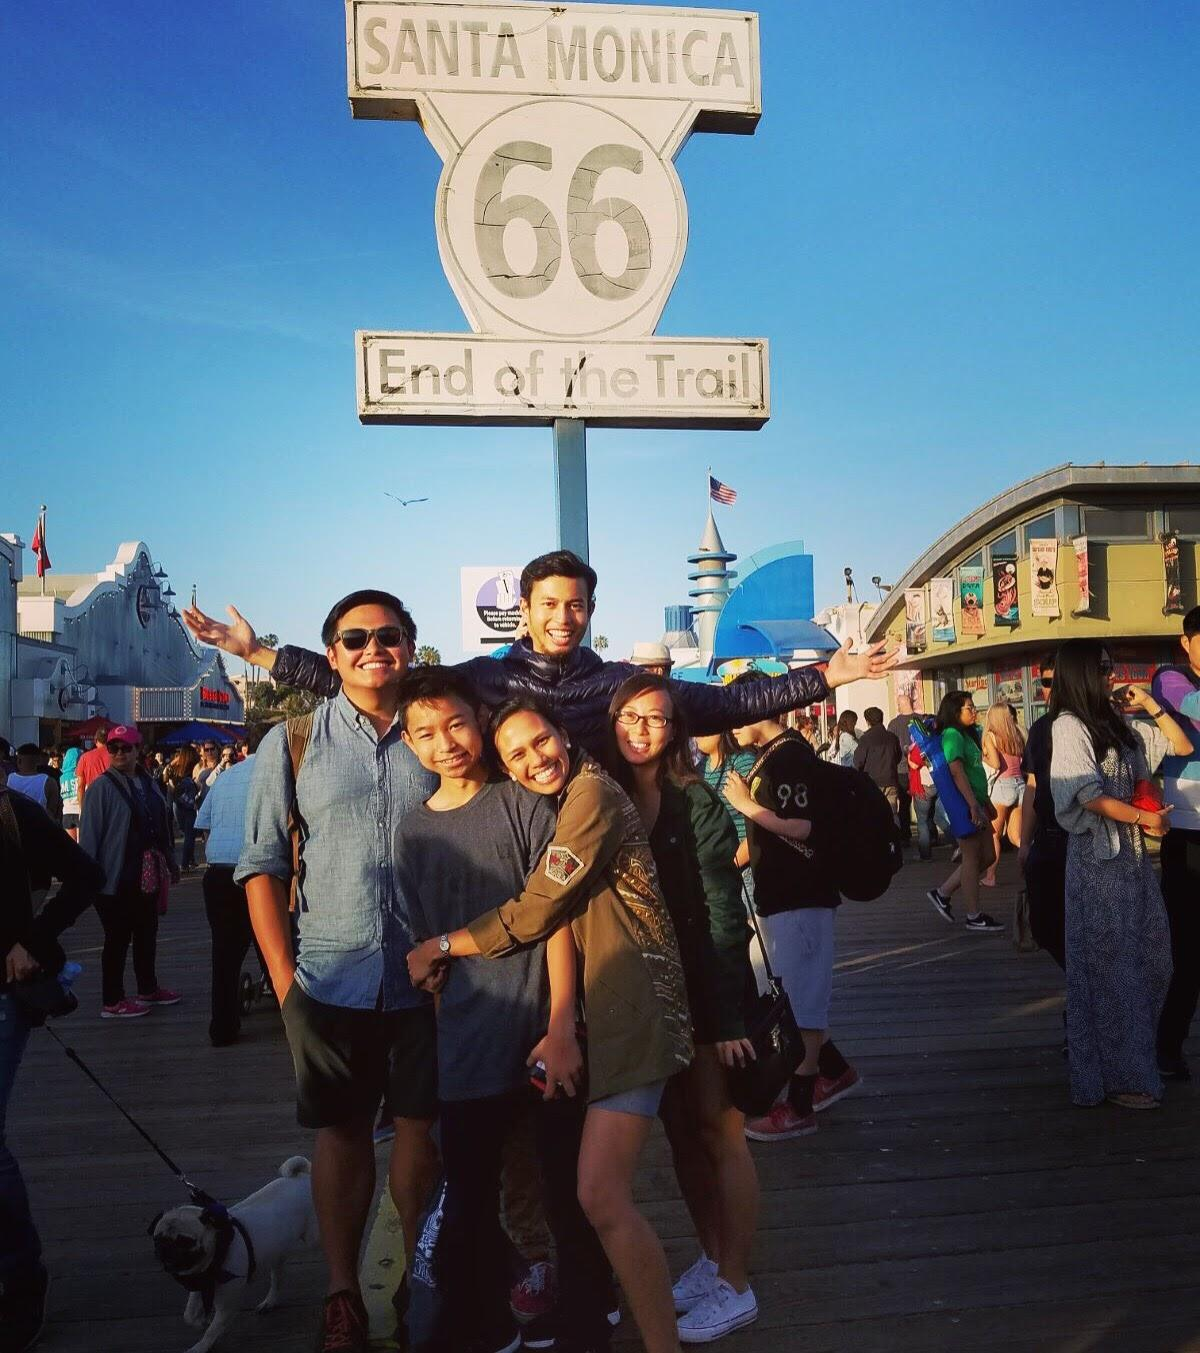 Santa Monica with Ate Niel, Carl, and Manot, April 2017